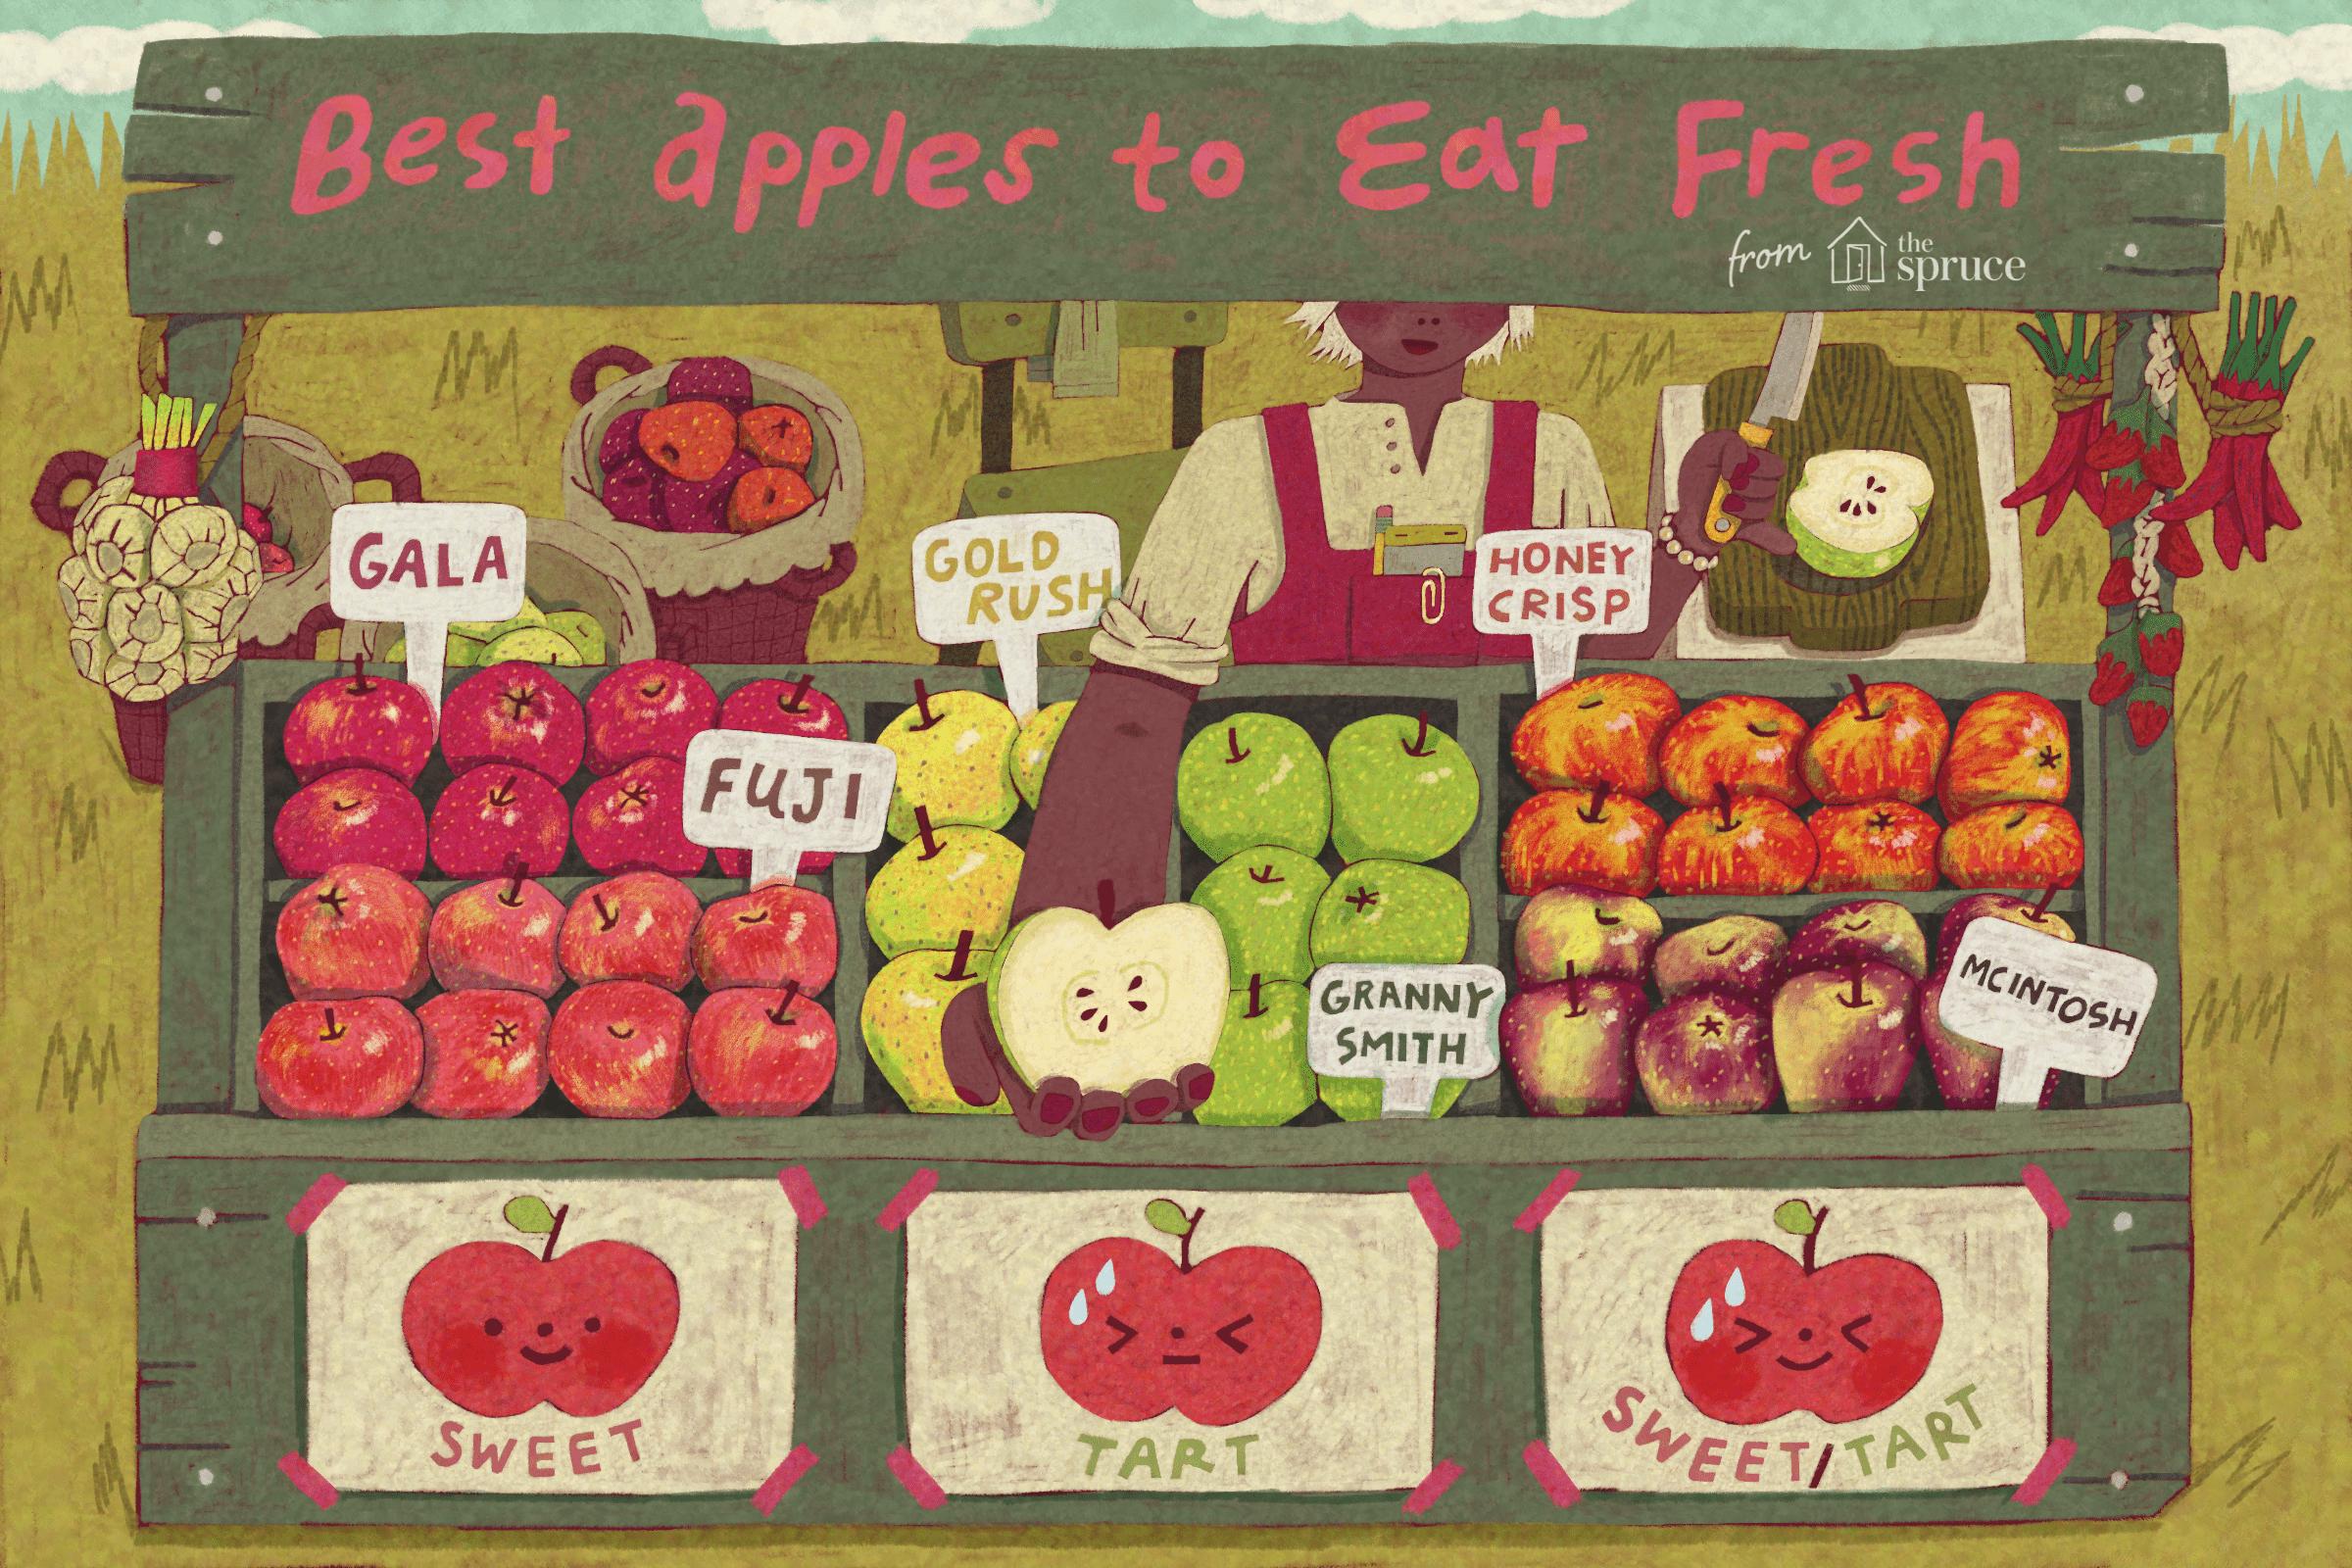 Best apples to eat fresh